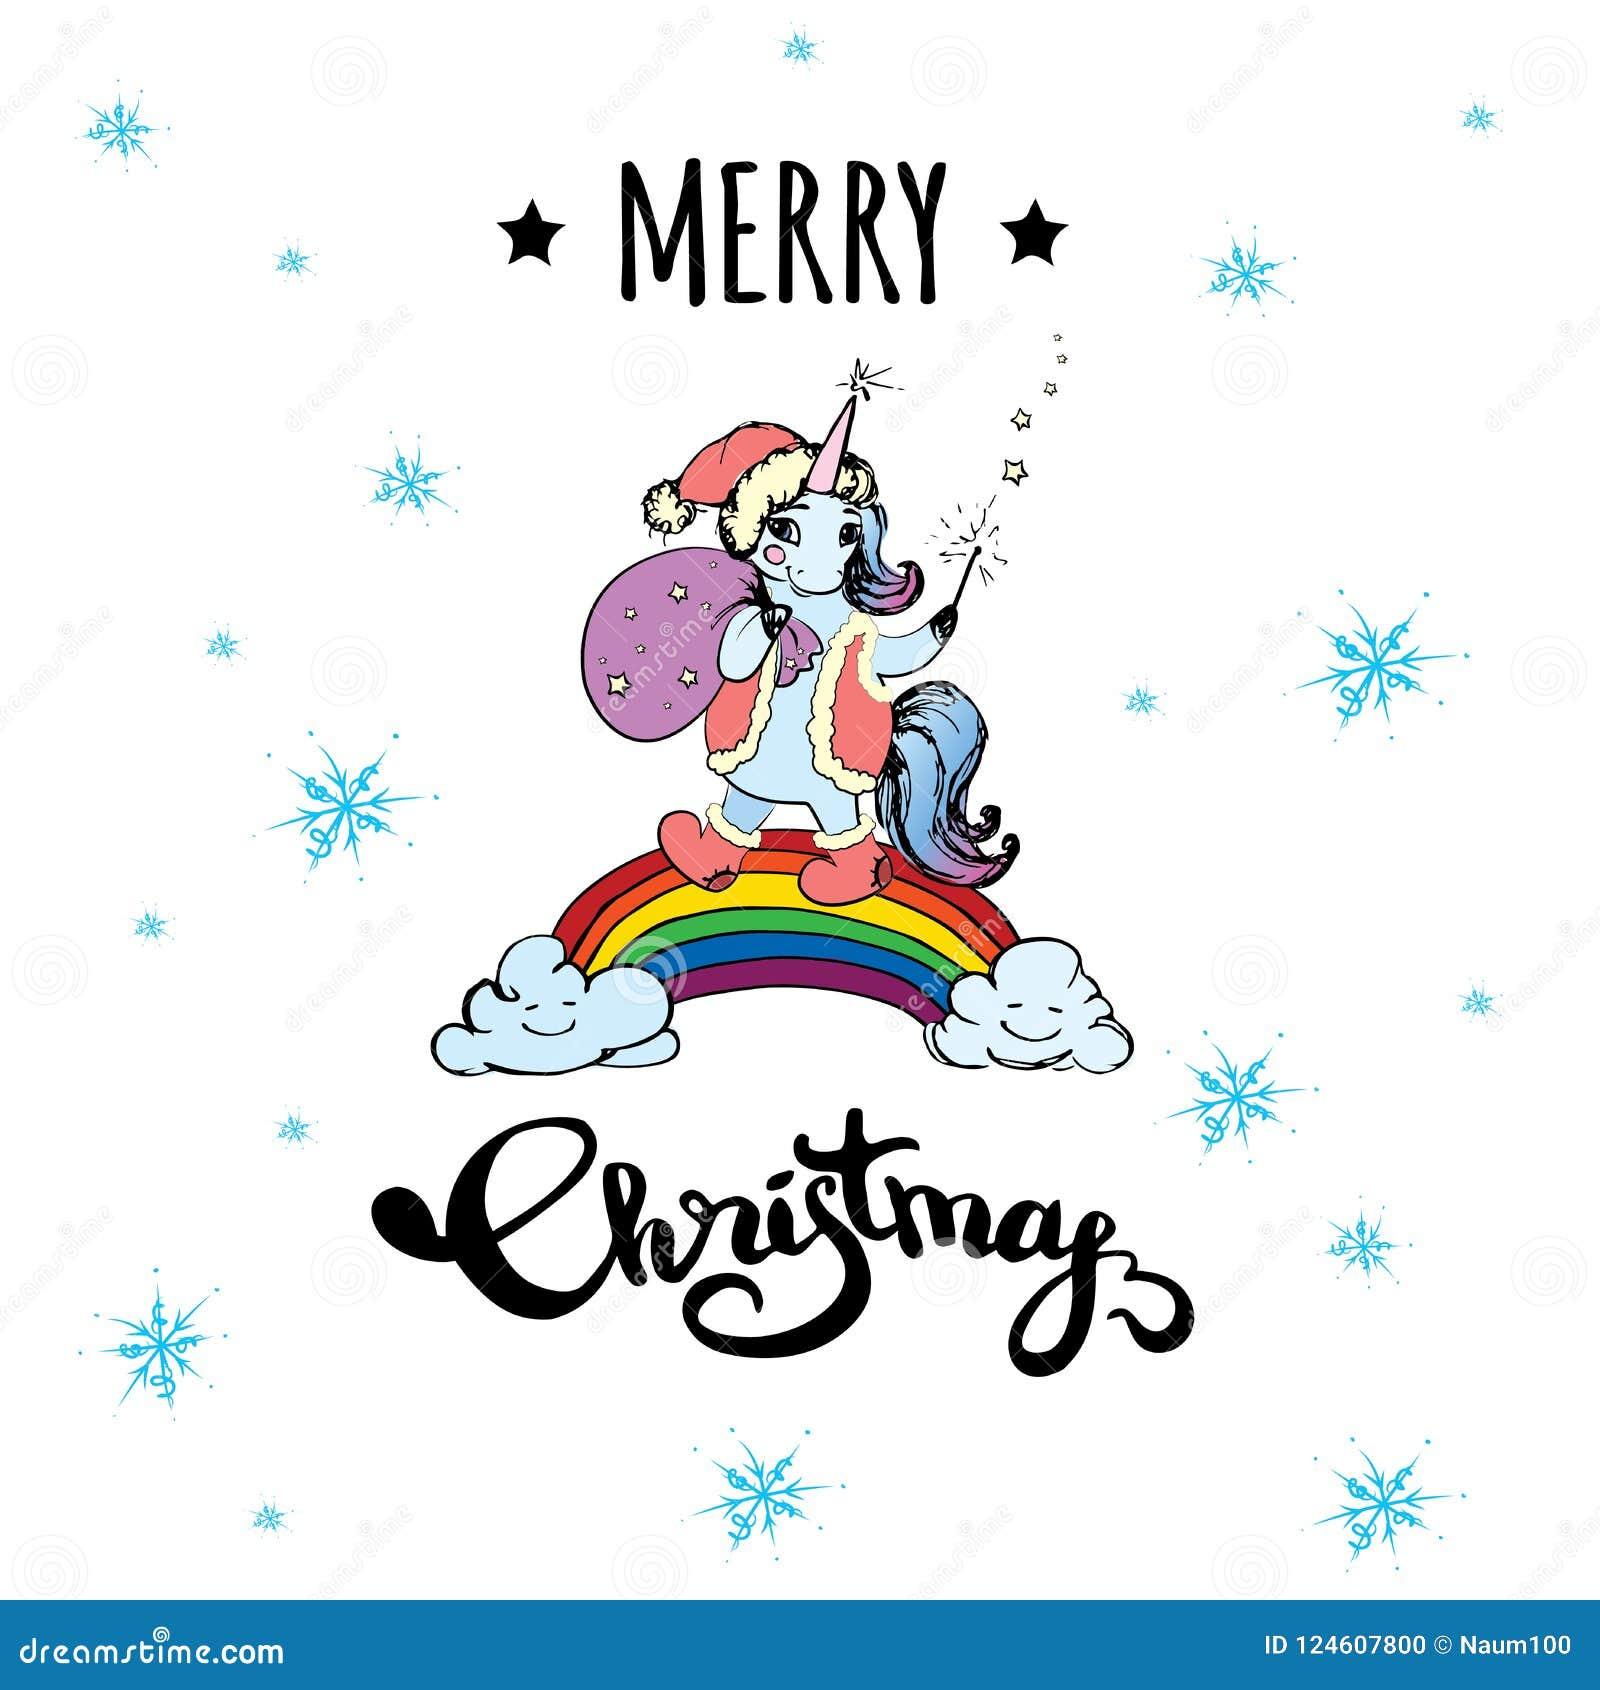 download cute xmas unicorn standing on rainbow stock vector illustration of hand felt - Christmas Unicorn